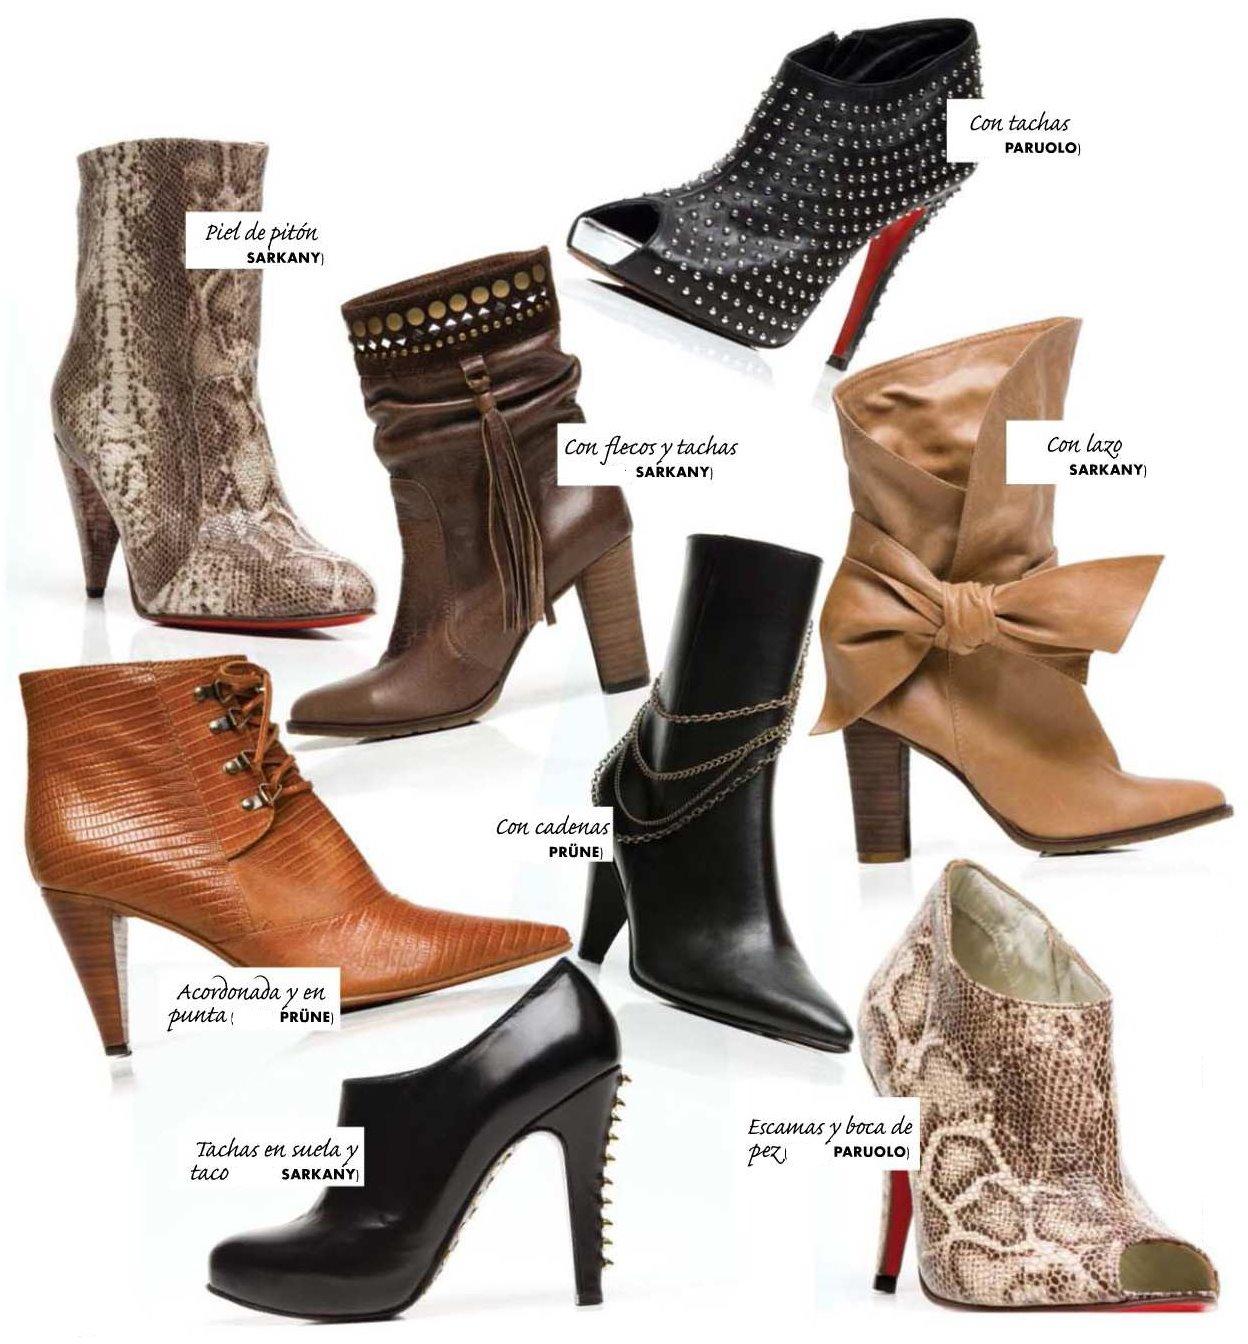 http://3.bp.blogspot.com/_hLJlfG3YyWo/Smo33oNofoI/AAAAAAAAEI8/rWzmXs1CJ7M/s1600/zapatos05.jpg